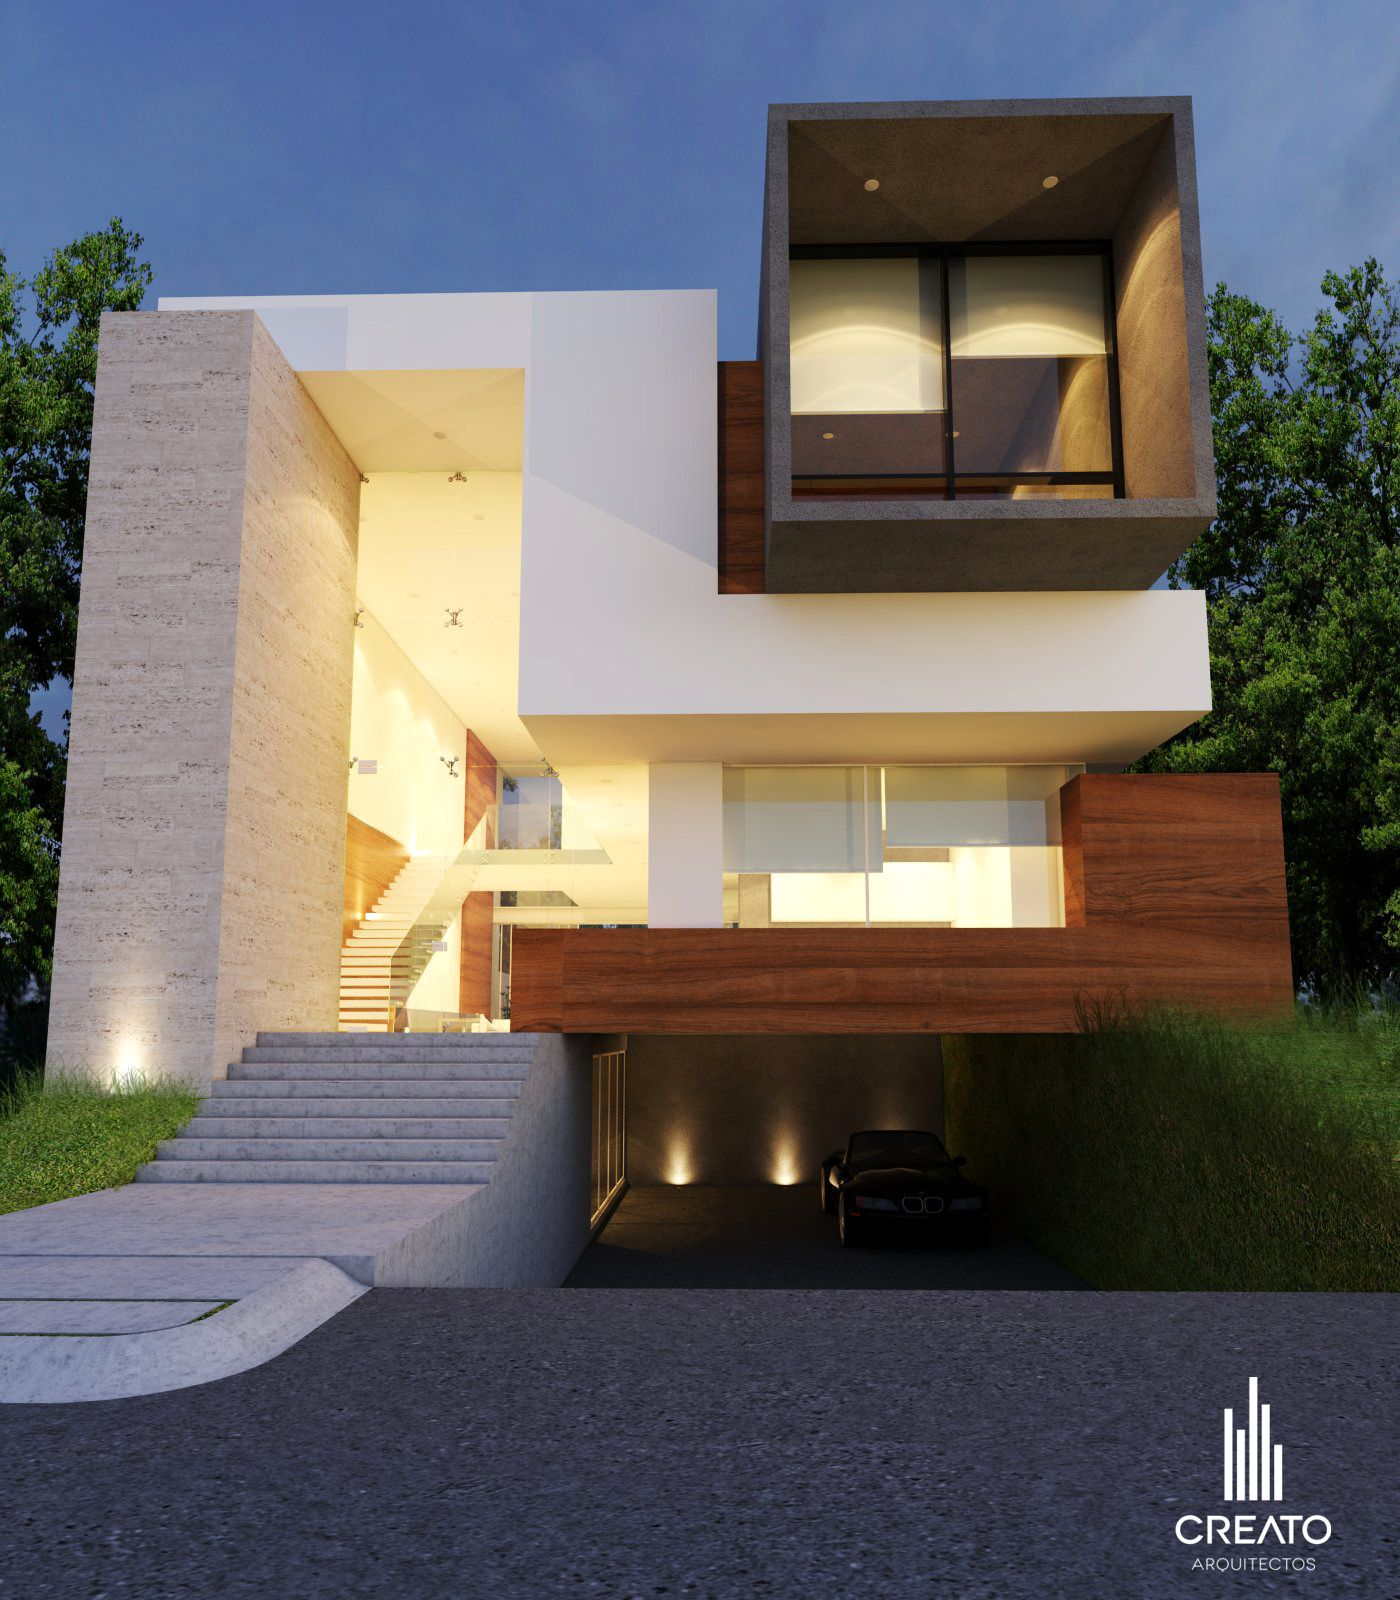 Image Result For Carport Under Modern House: Casa La Joya Guadalajara Jal, #Creato Arquitectos